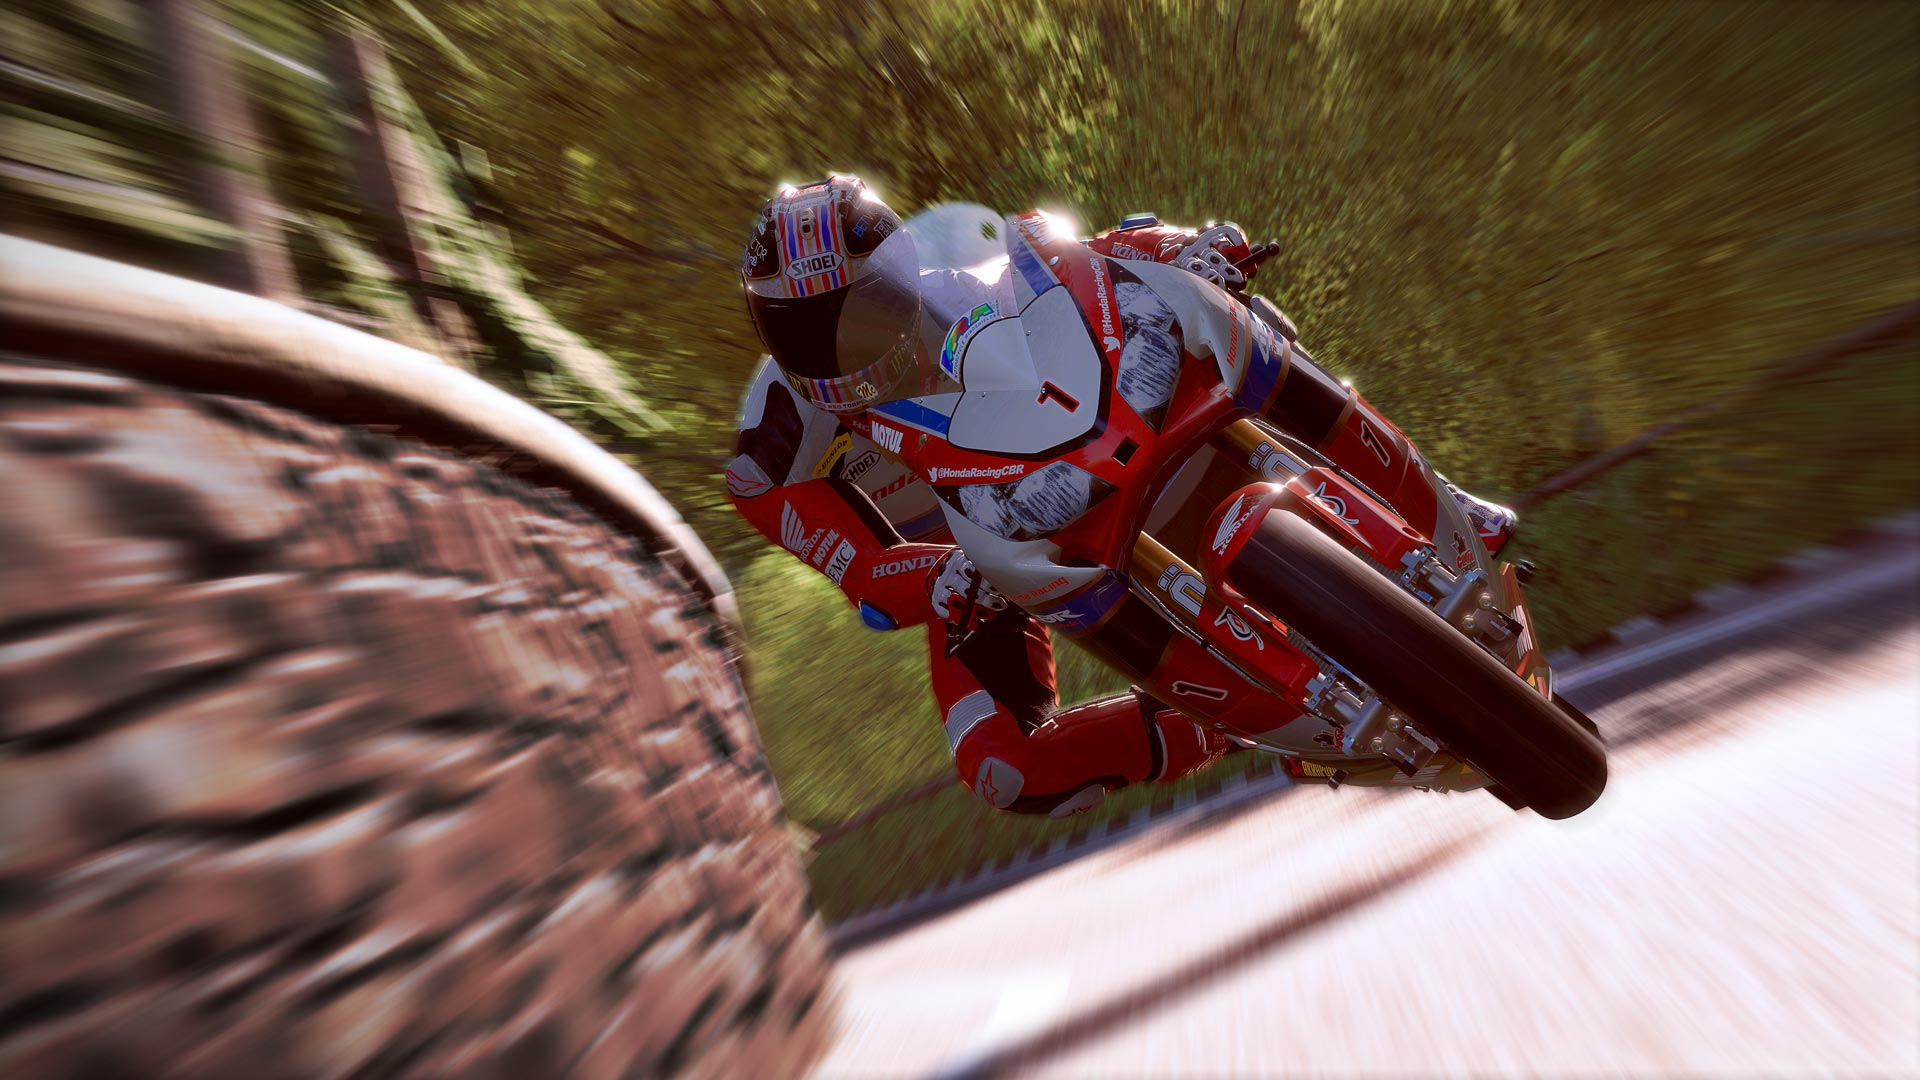 TT Isle of Man - Ride on the Edge скриншот 5